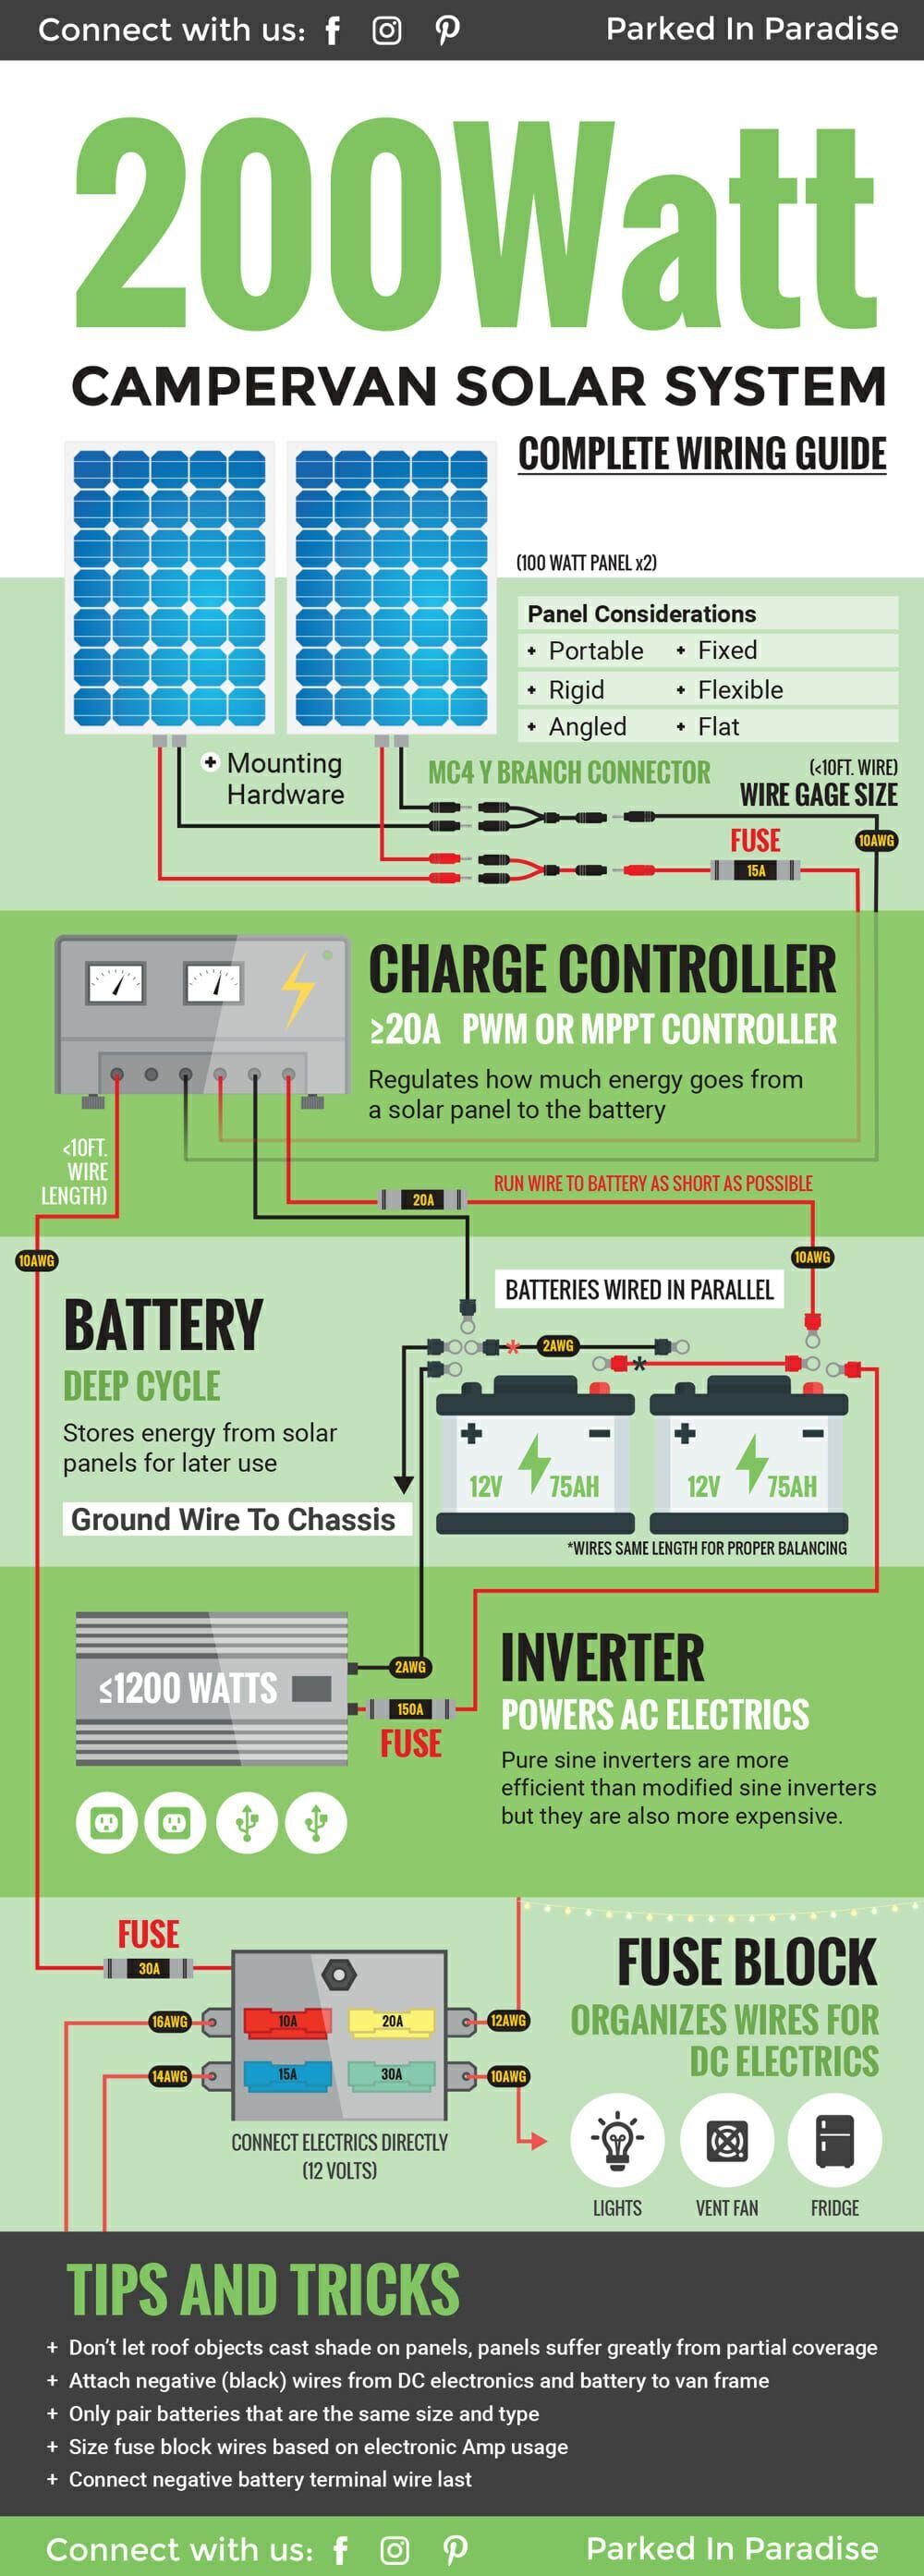 [SCHEMATICS_4PO]  T6 Ballast Wiring Diagram - Wiring Diagrams   T6 Light 6 Watts Wiring Diagram      wood.risk.lesvignoblesguimberteau.fr